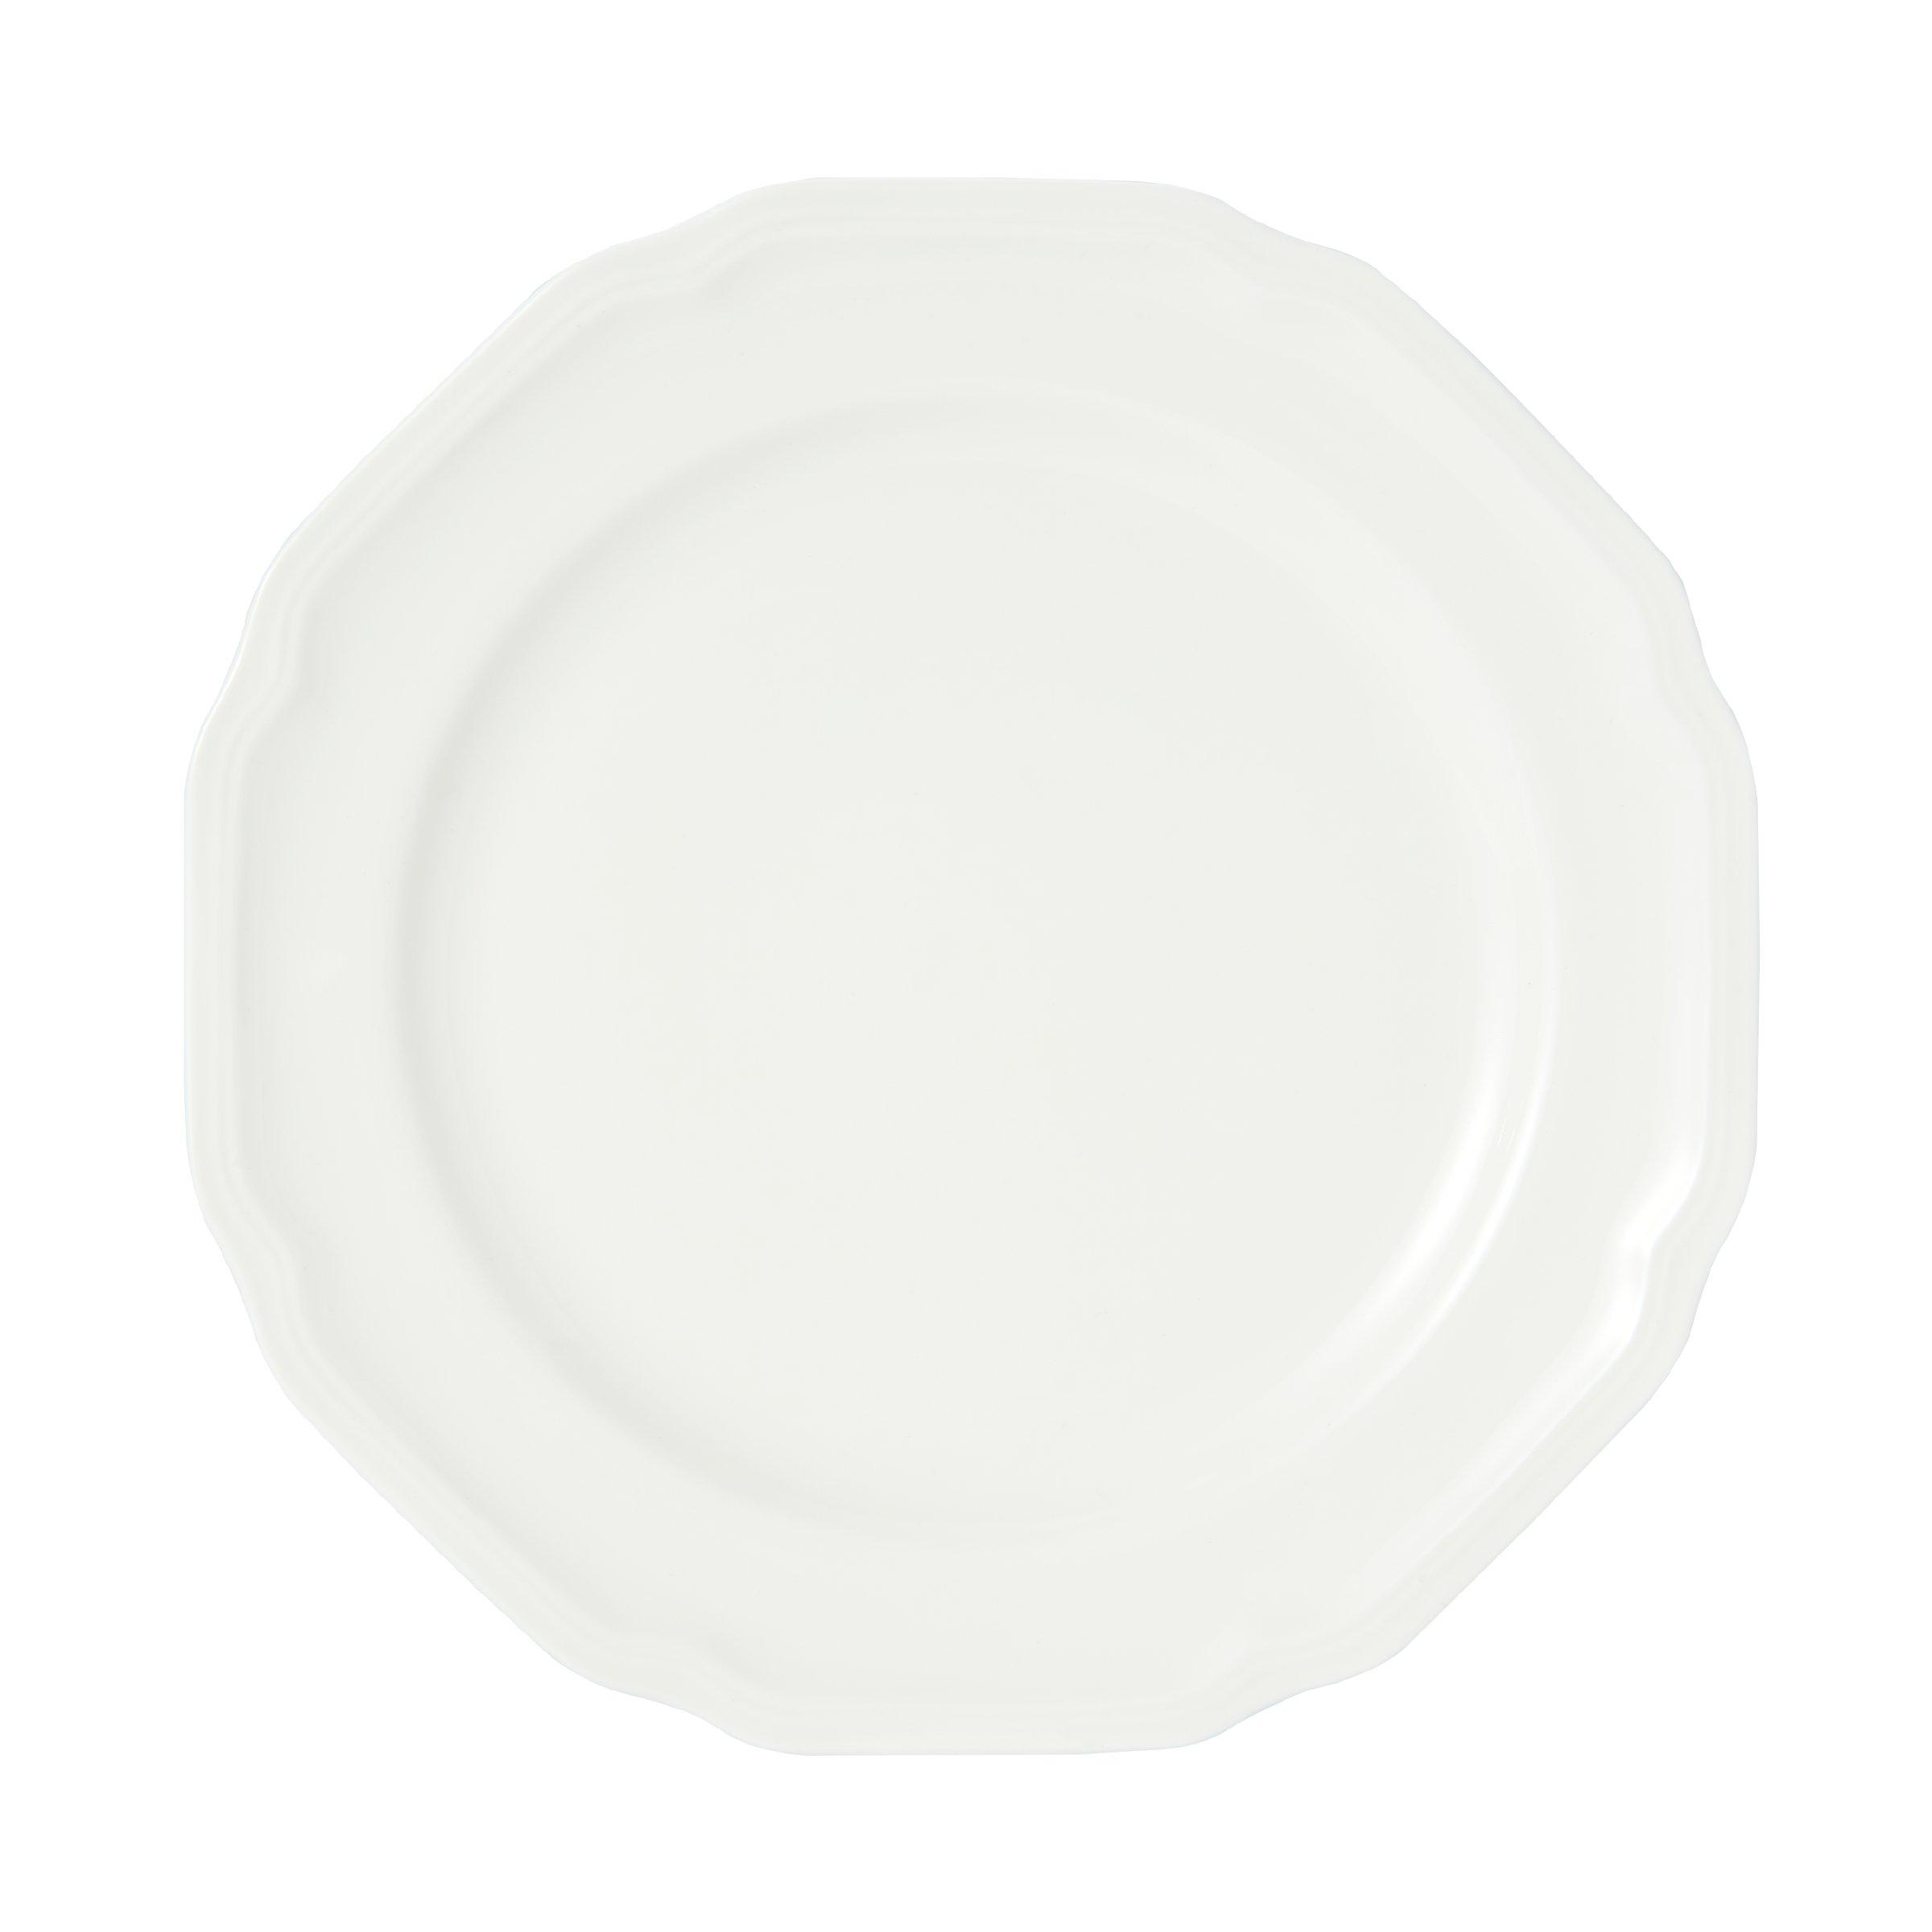 Mikasa Antique White 16-Piece Dinnerware Set, Service for 4 by Mikasa (Image #4)